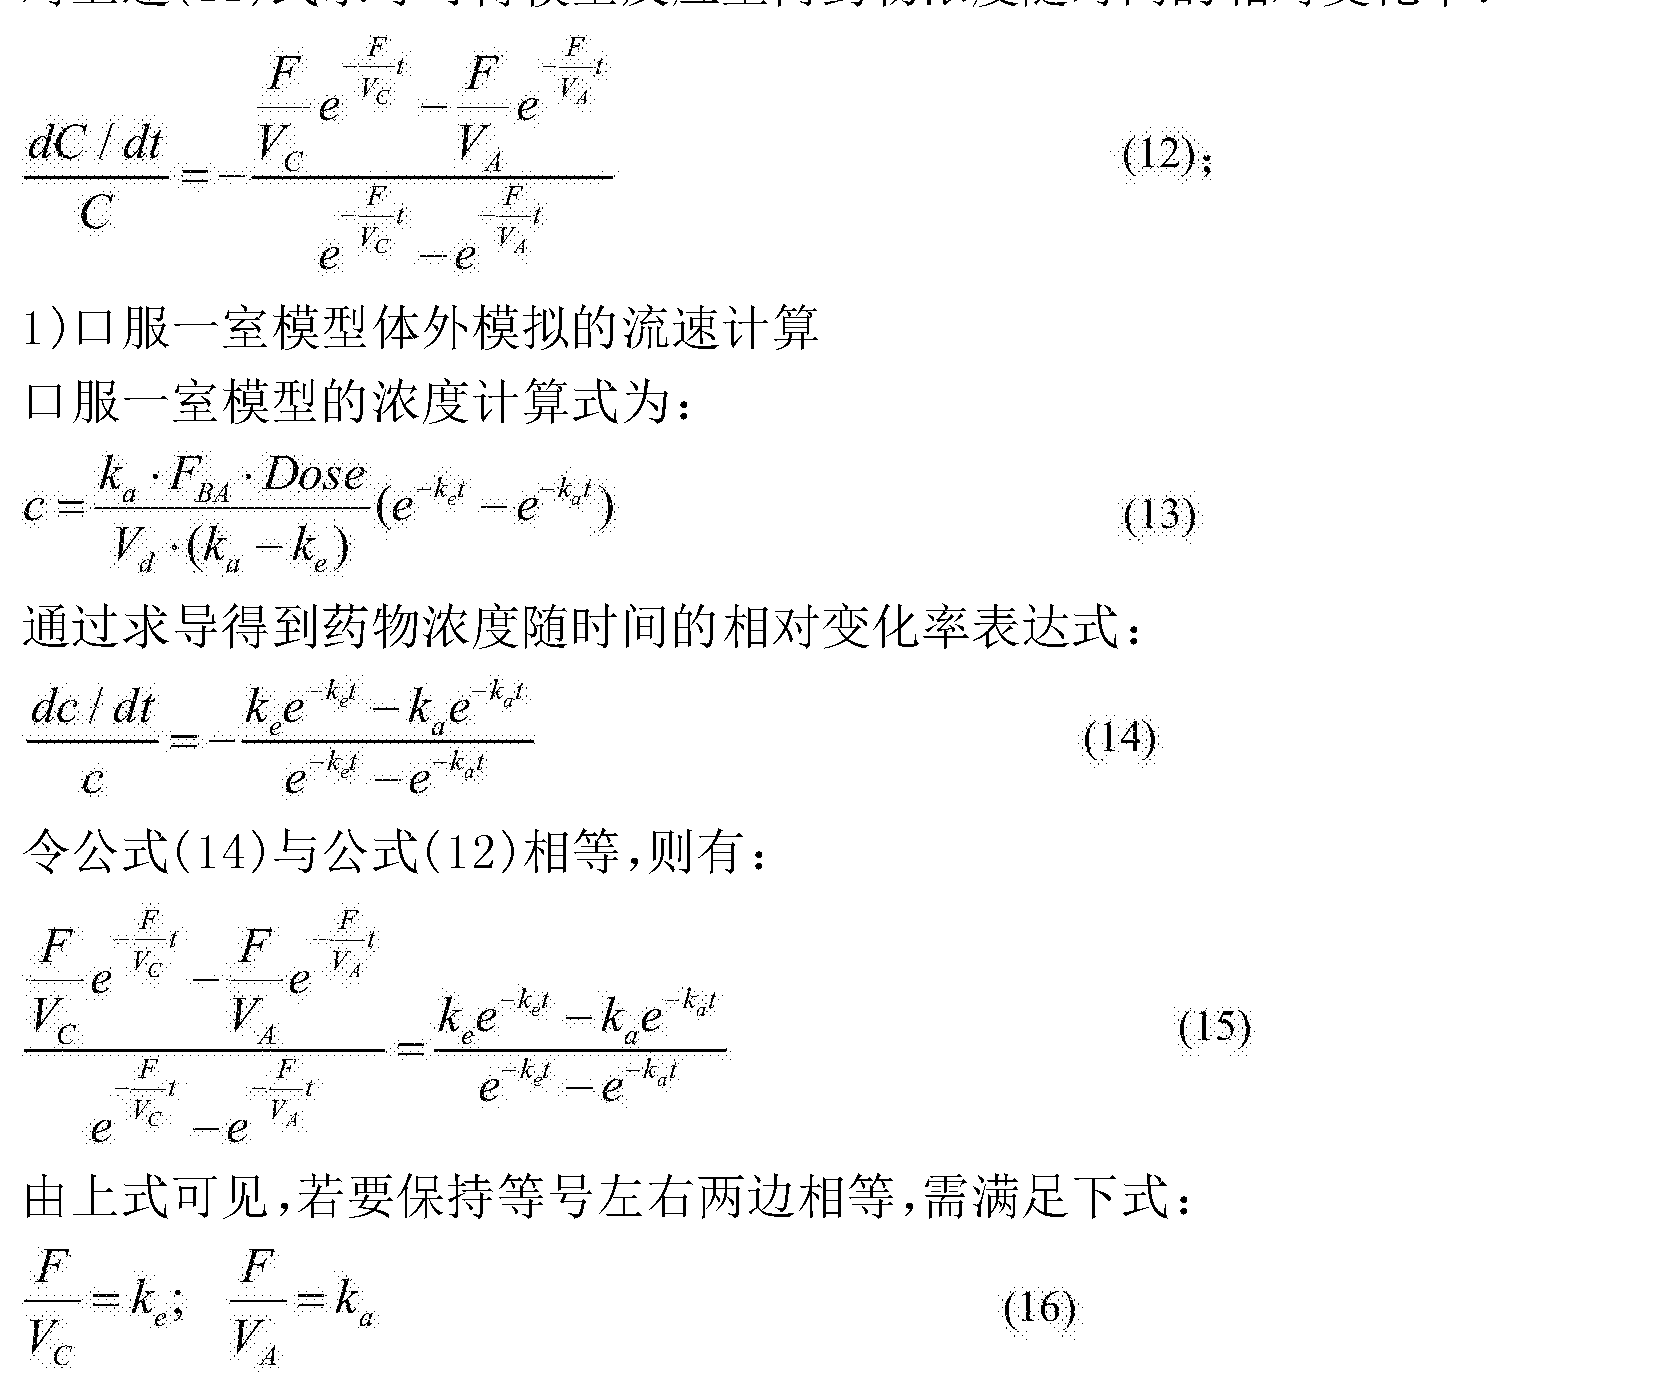 100+ EPIC Best 計算式 - ジャジャトメガ